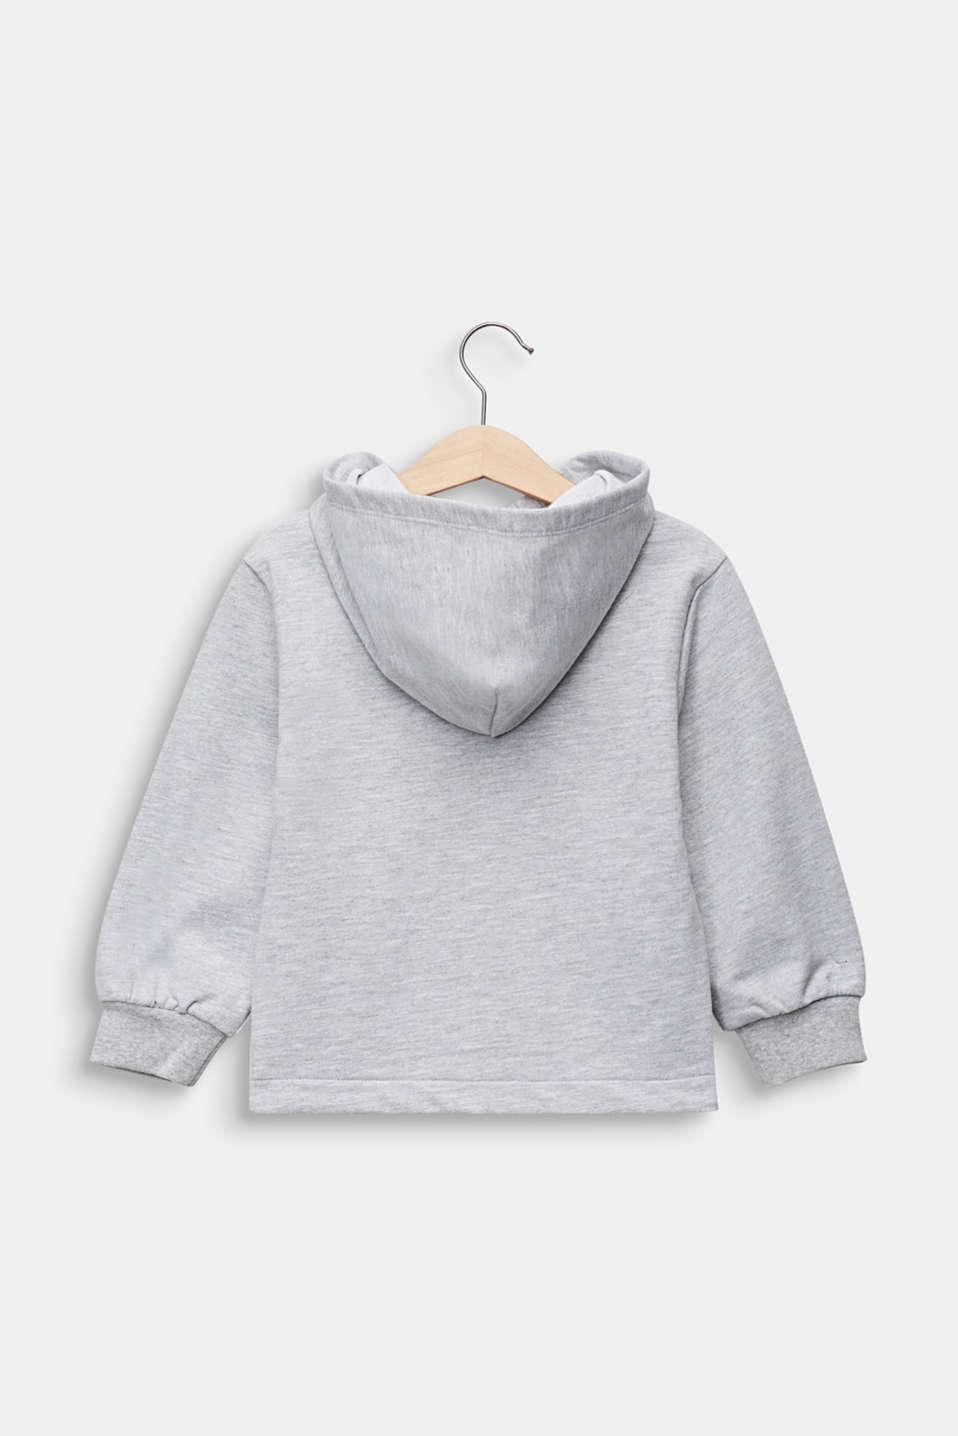 Logo sweatshirt hoodie, 100% cotton, HEATHER SILVER, detail image number 1